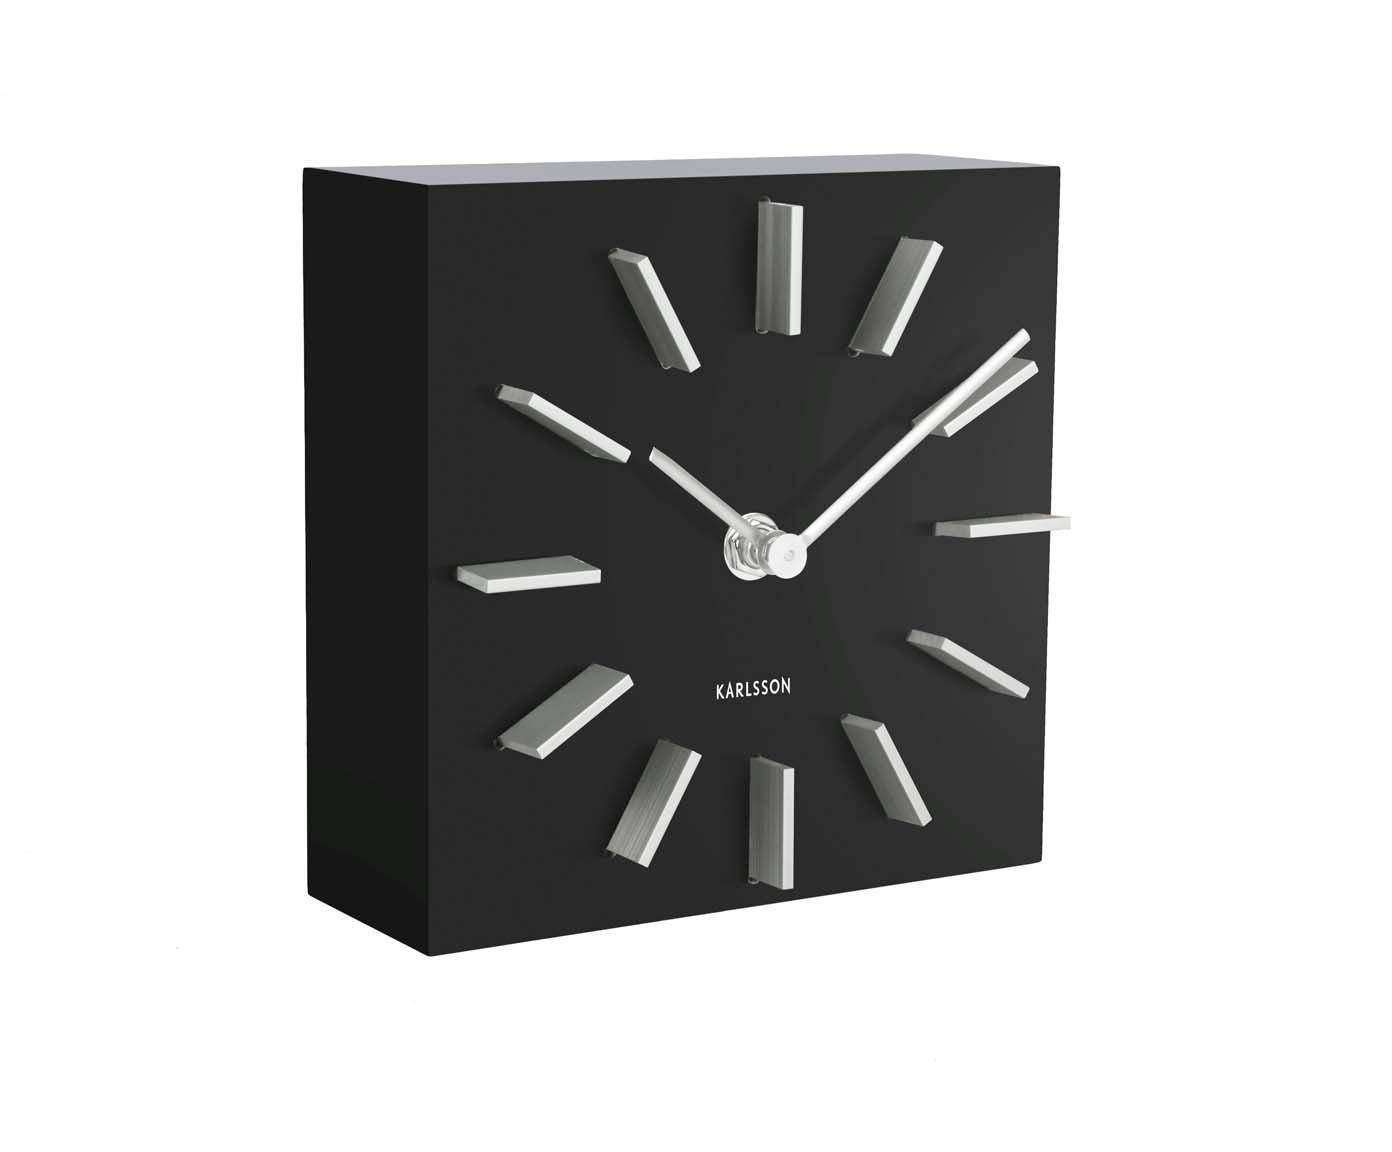 Wekker Discreet, MDF, Zwart, wit, 15 x 15 cm